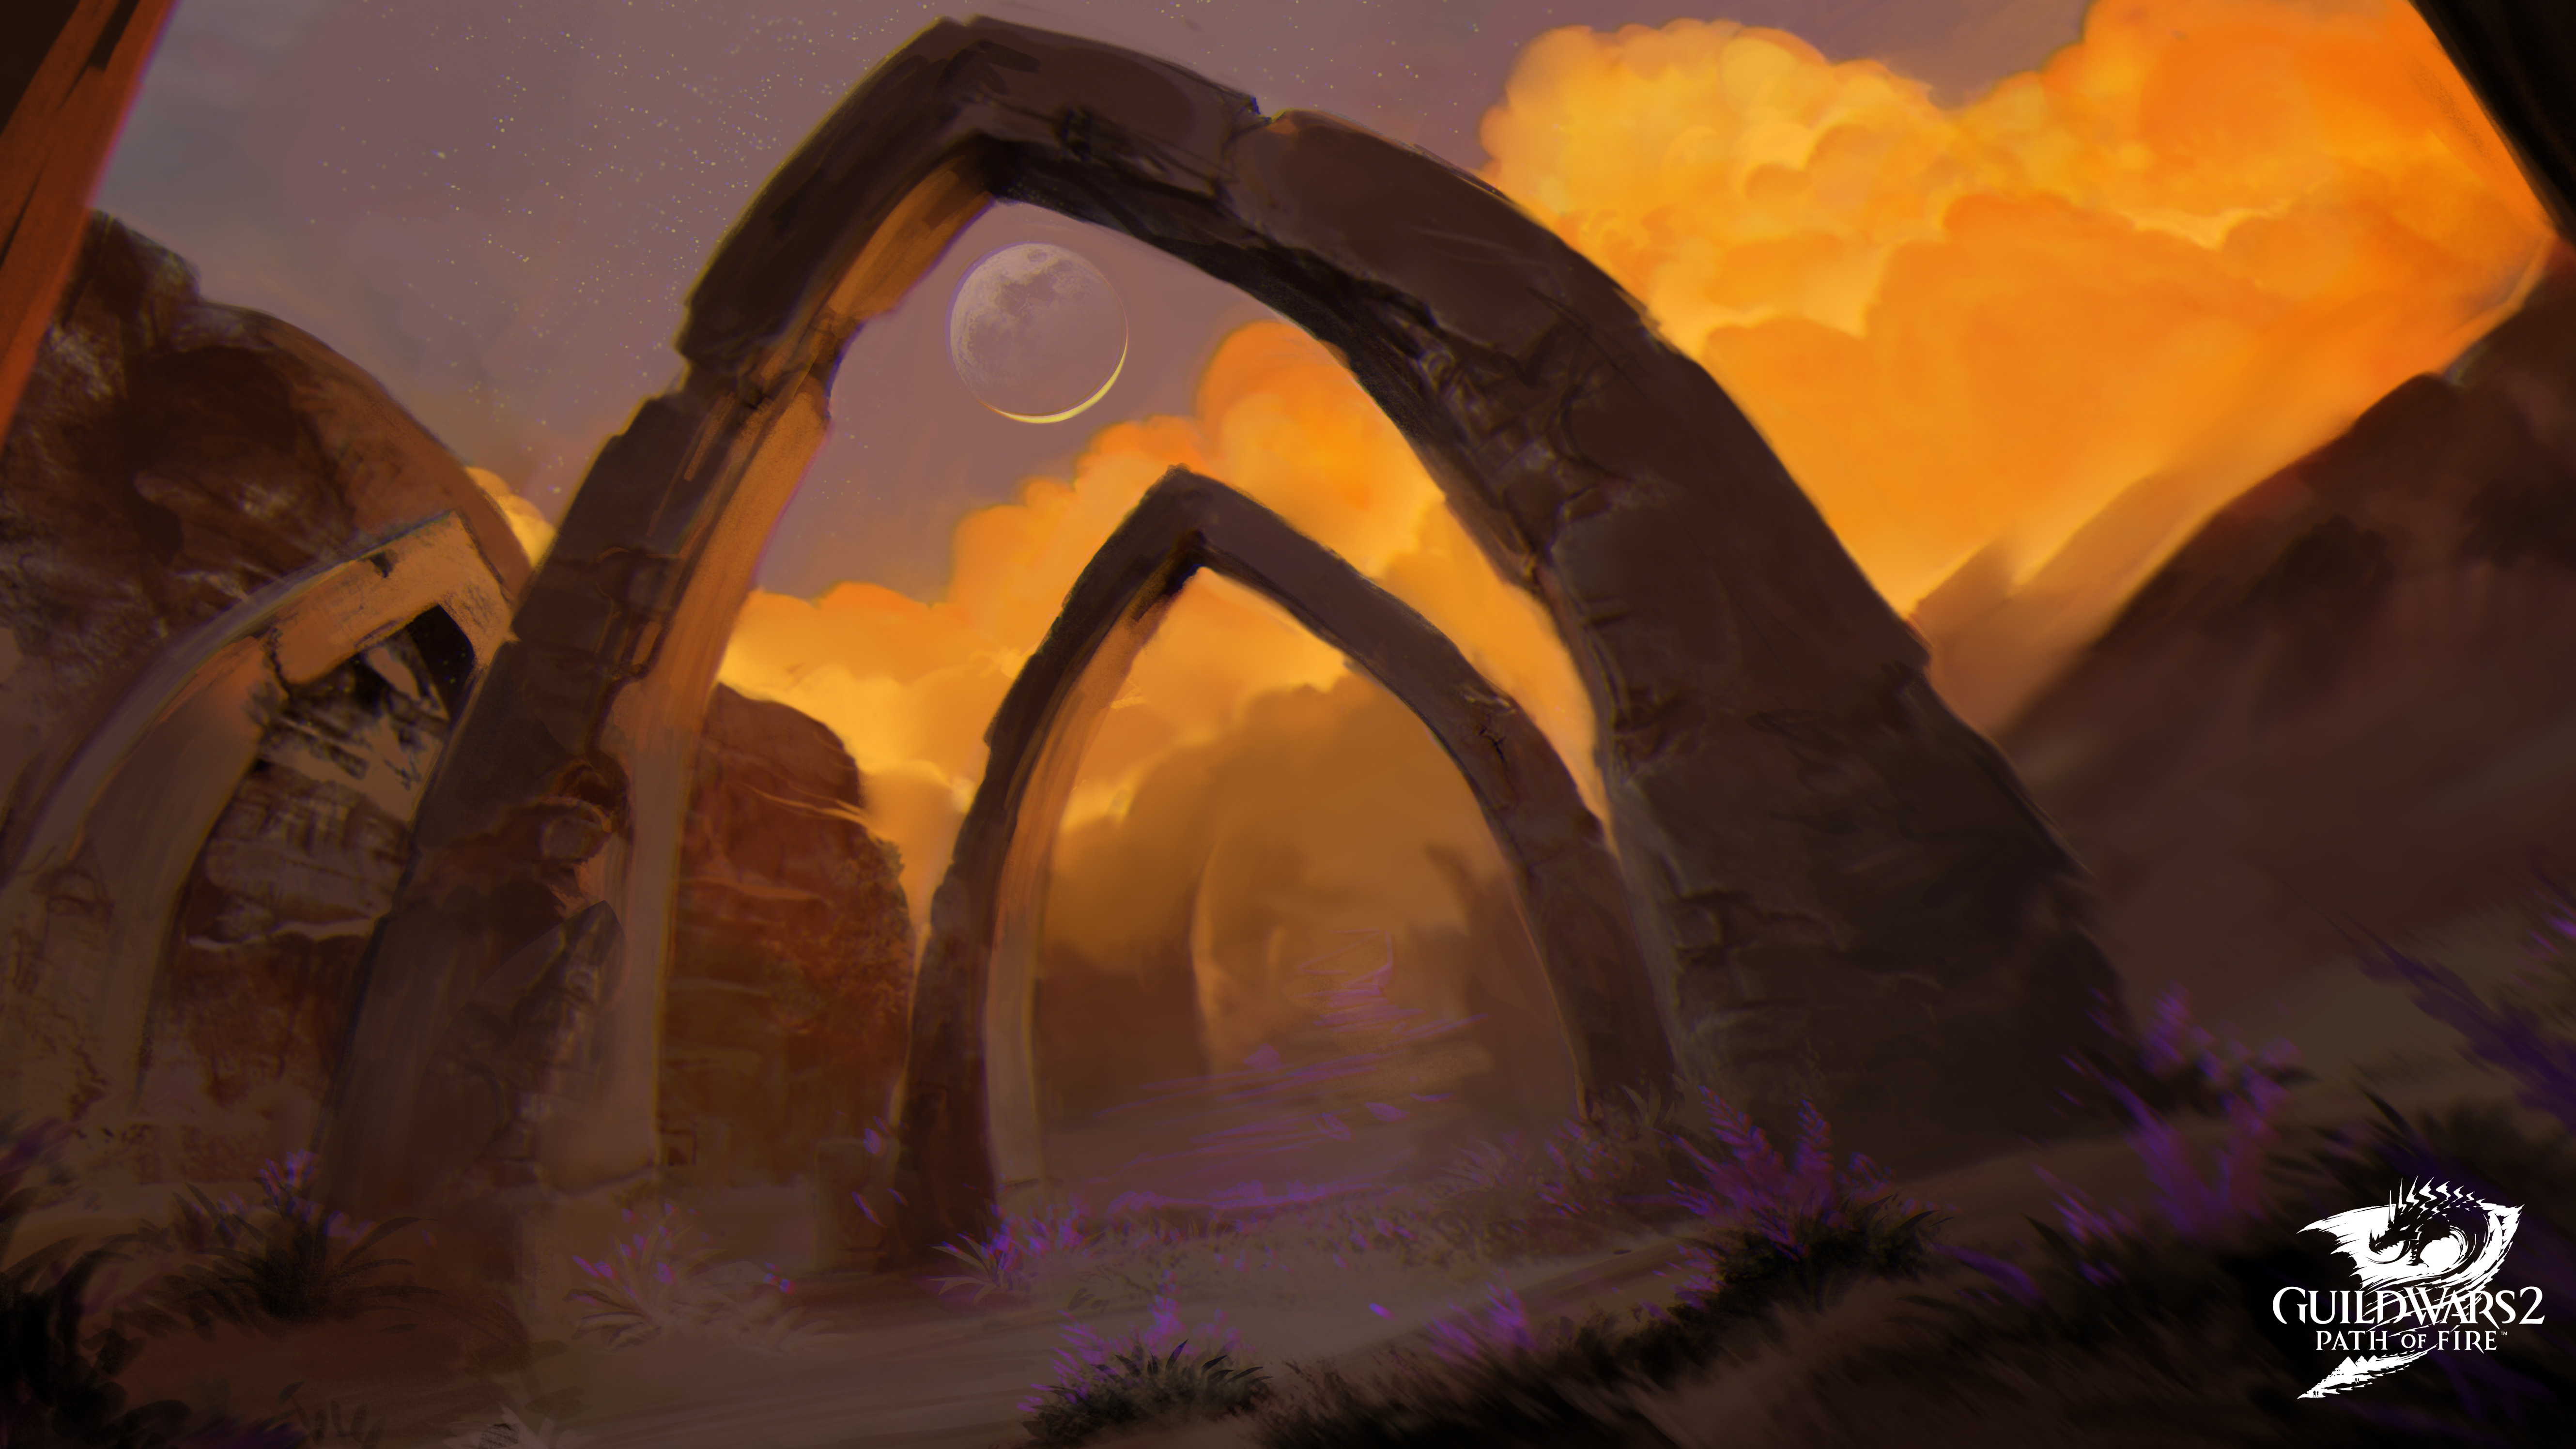 Concept Art | GuildWars2.com